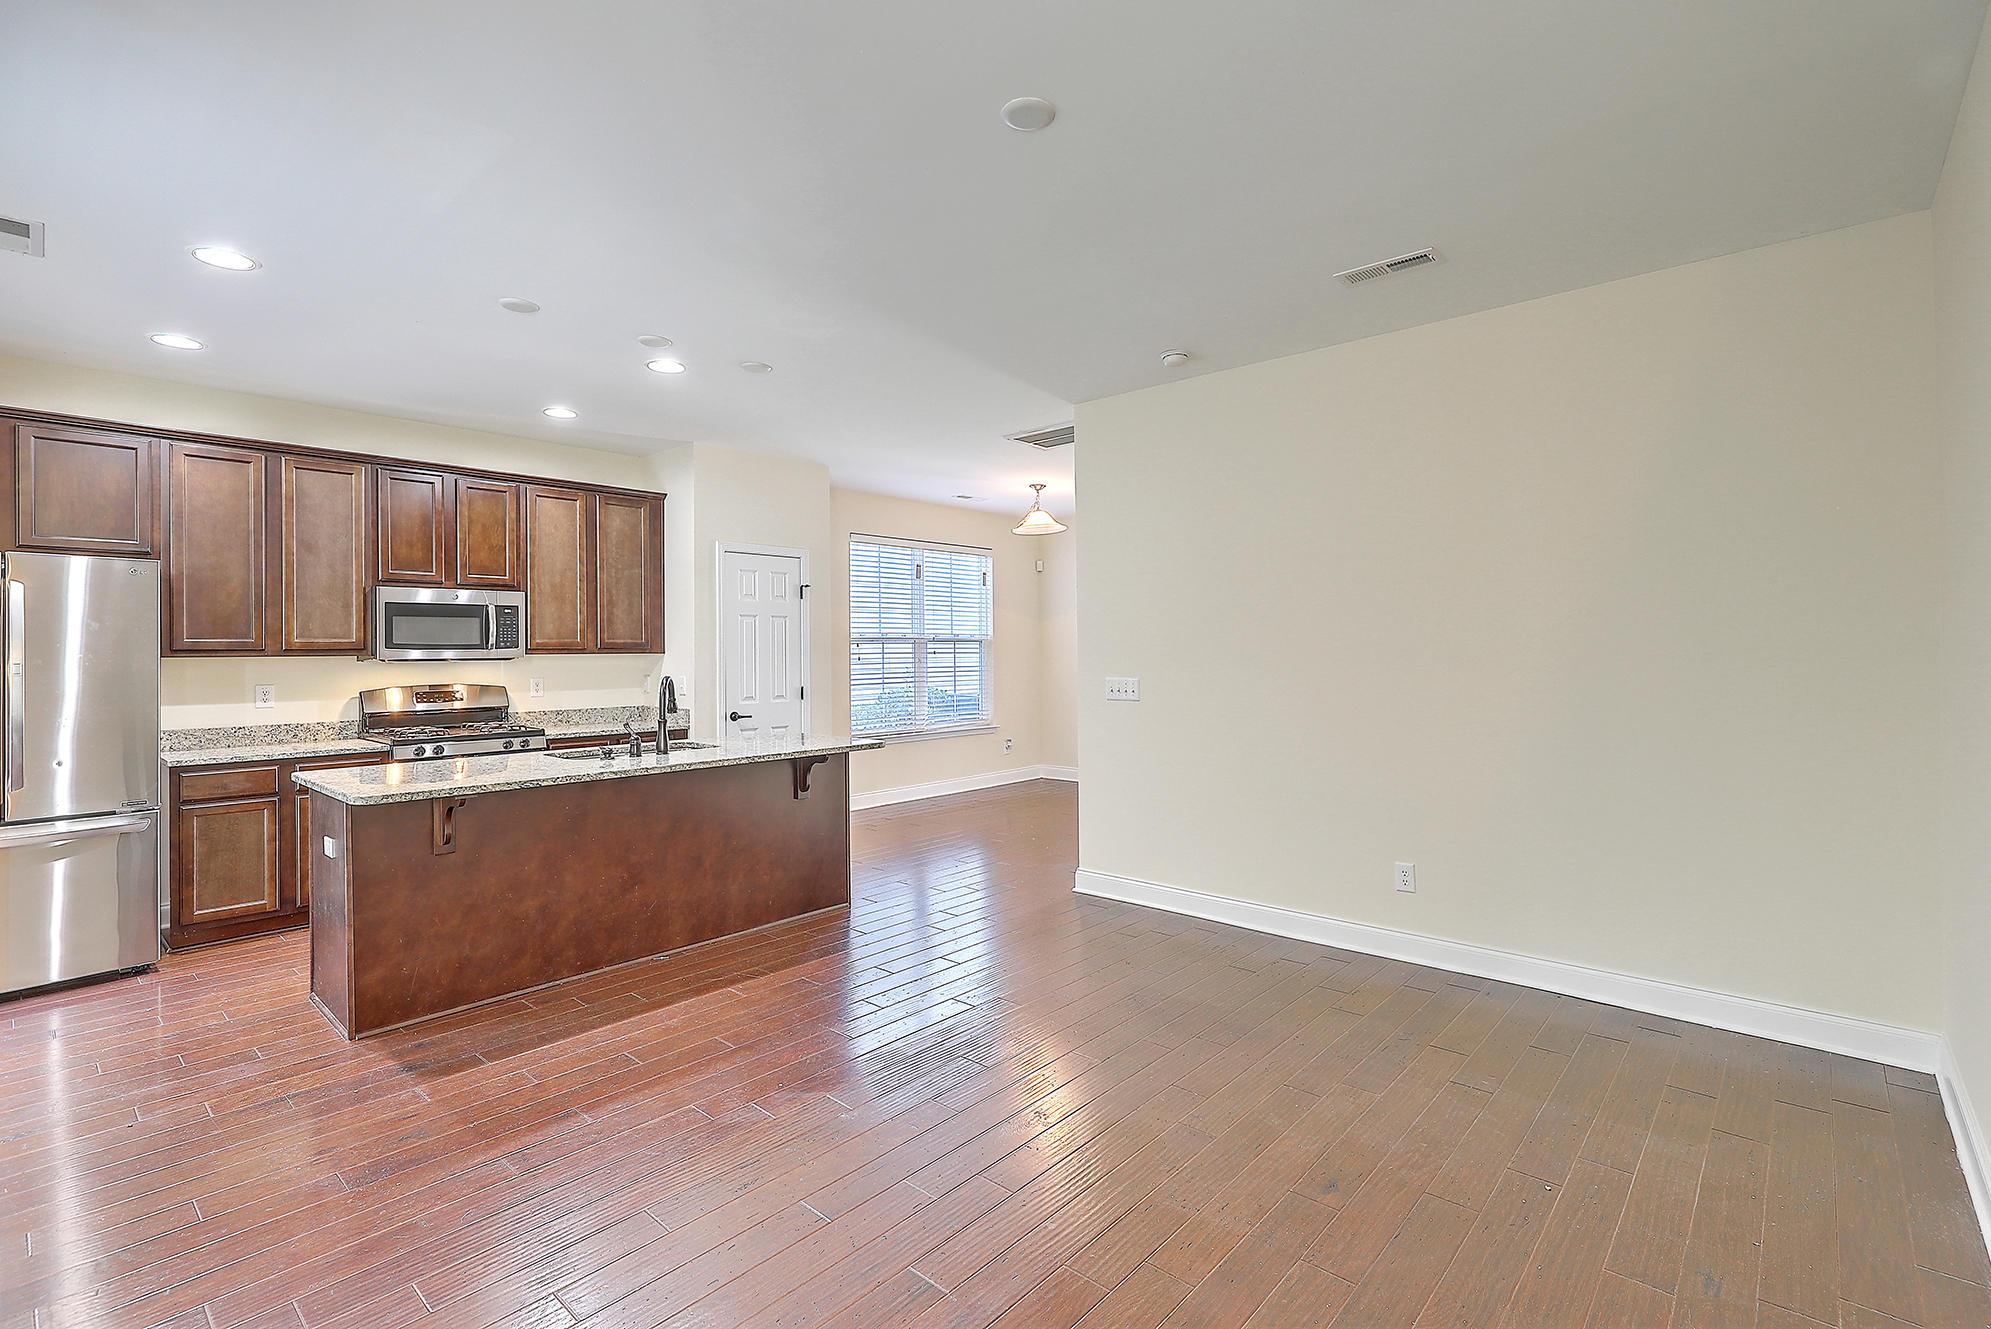 Grand Oaks Plantation Homes For Sale - 175 Larissa, Charleston, SC - 3